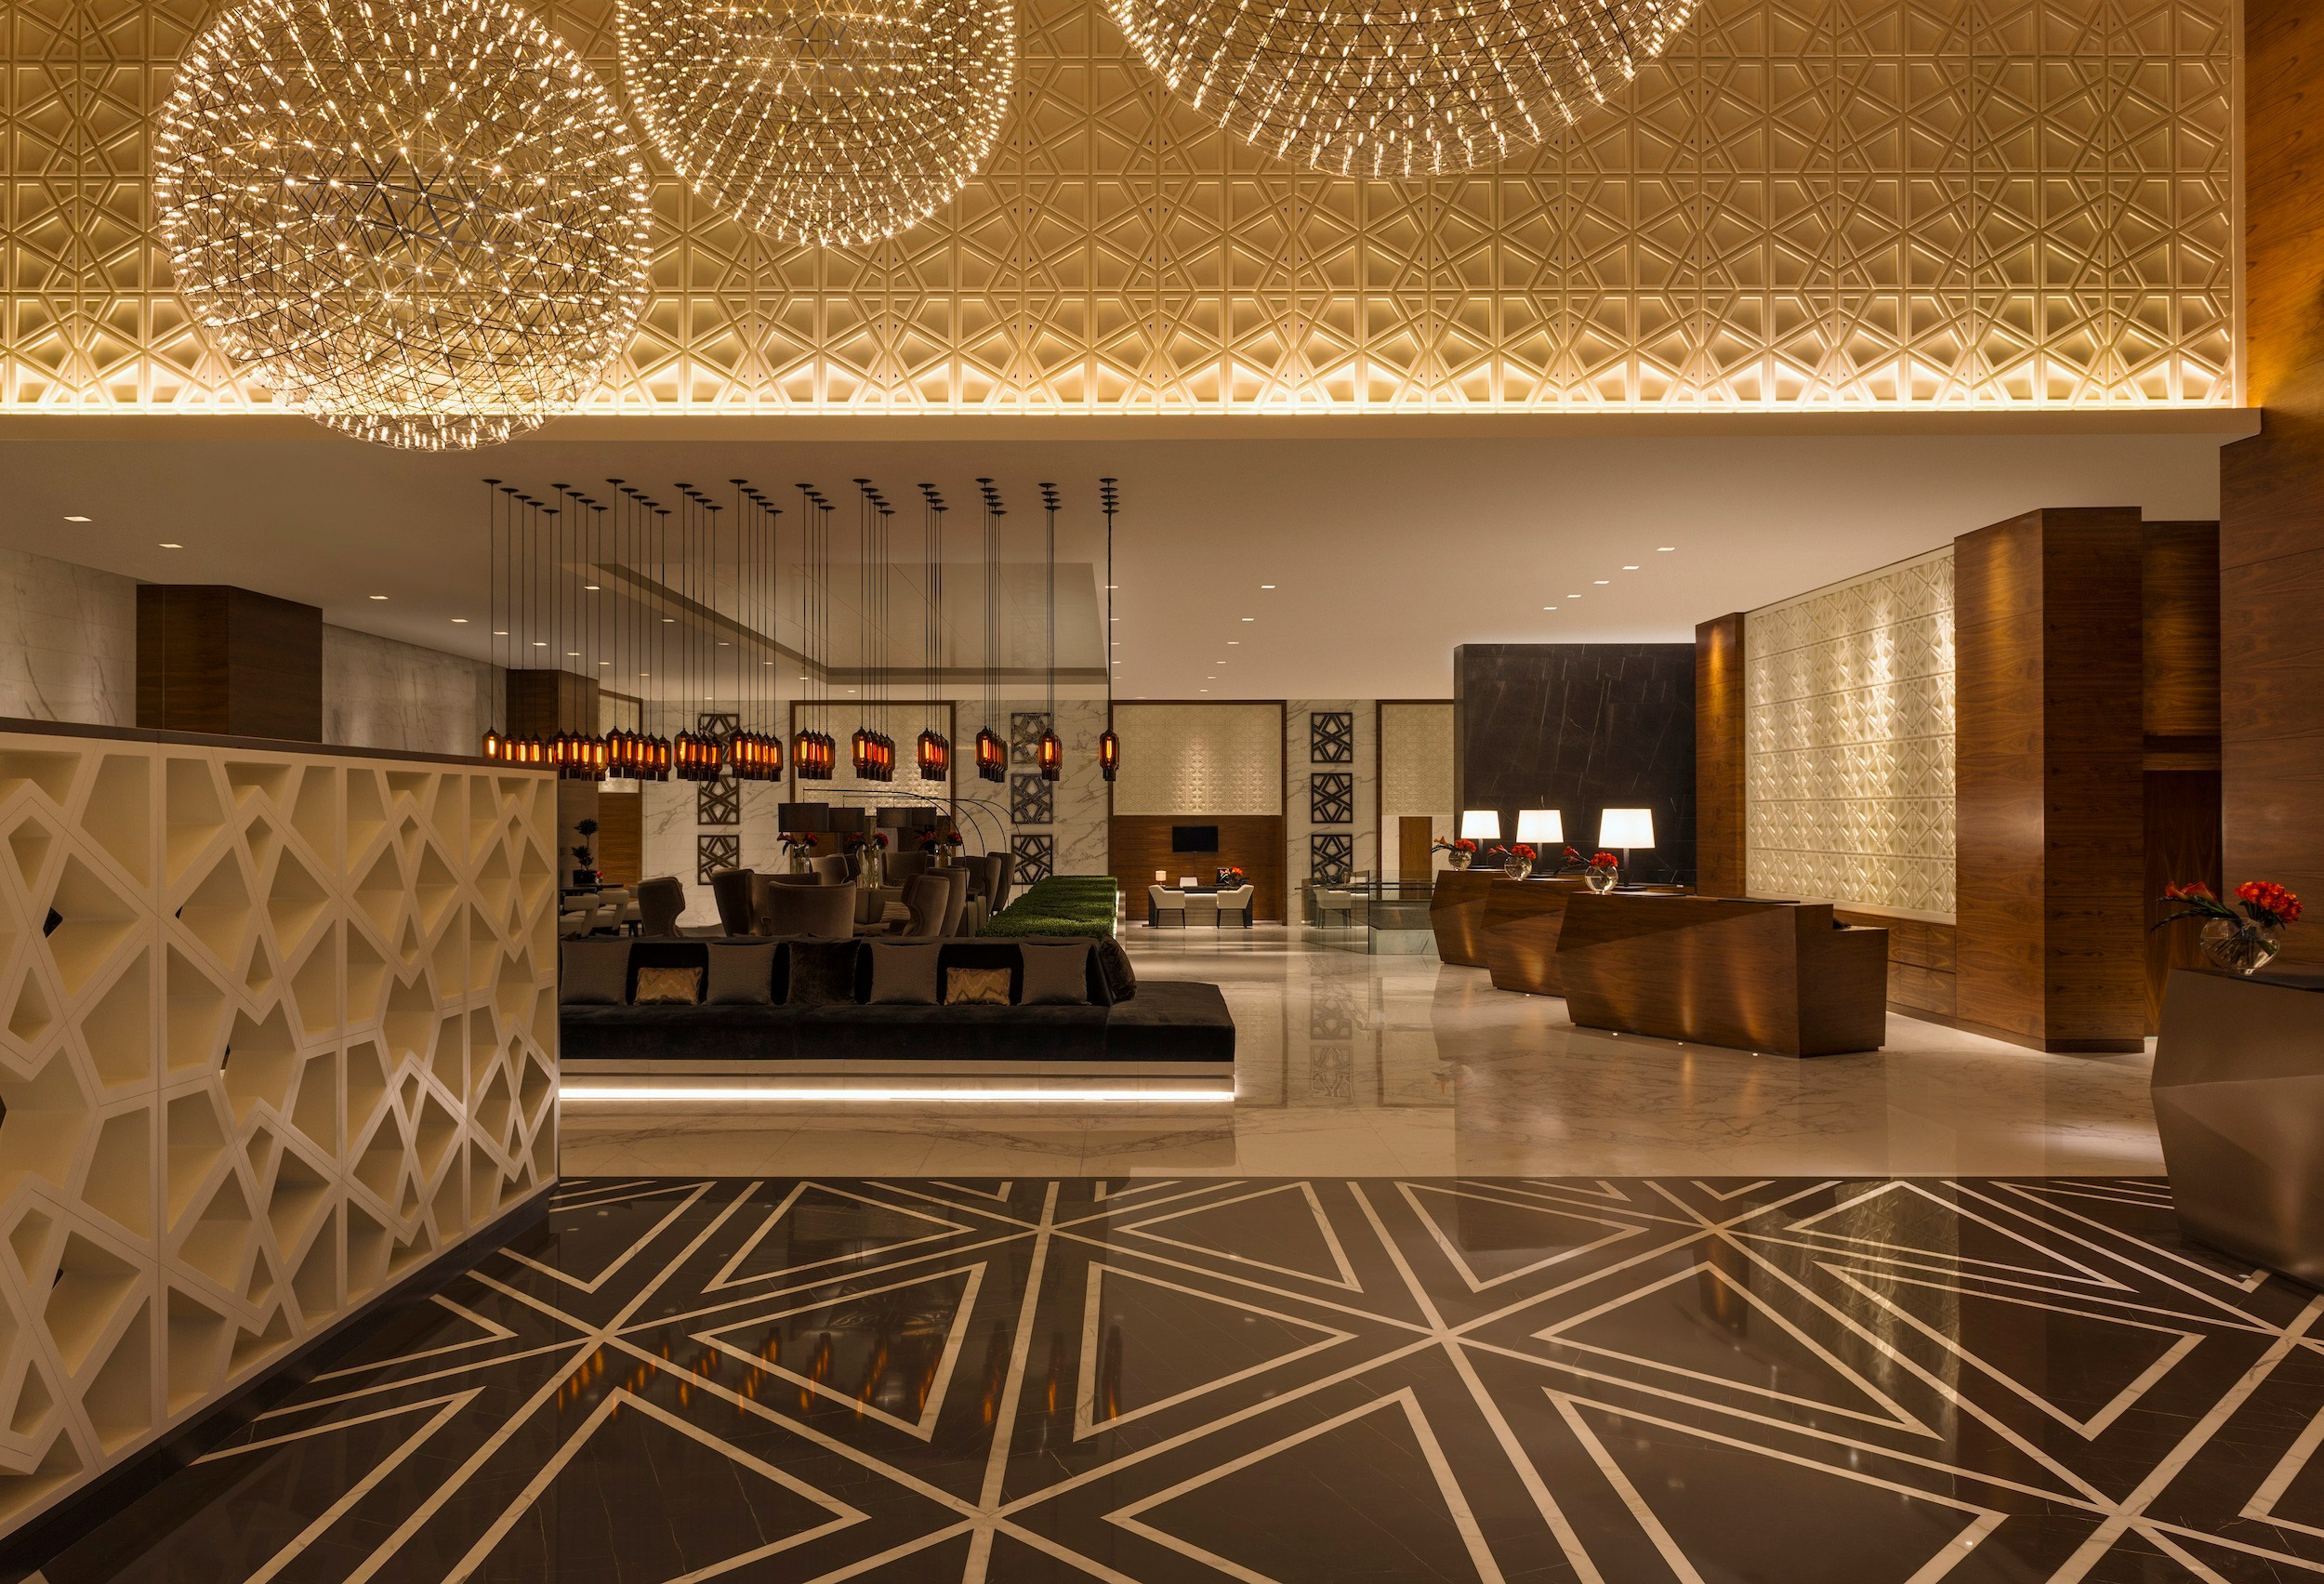 Sheraton Grand Hotel, Dubai - Lobby - DCC.jpg